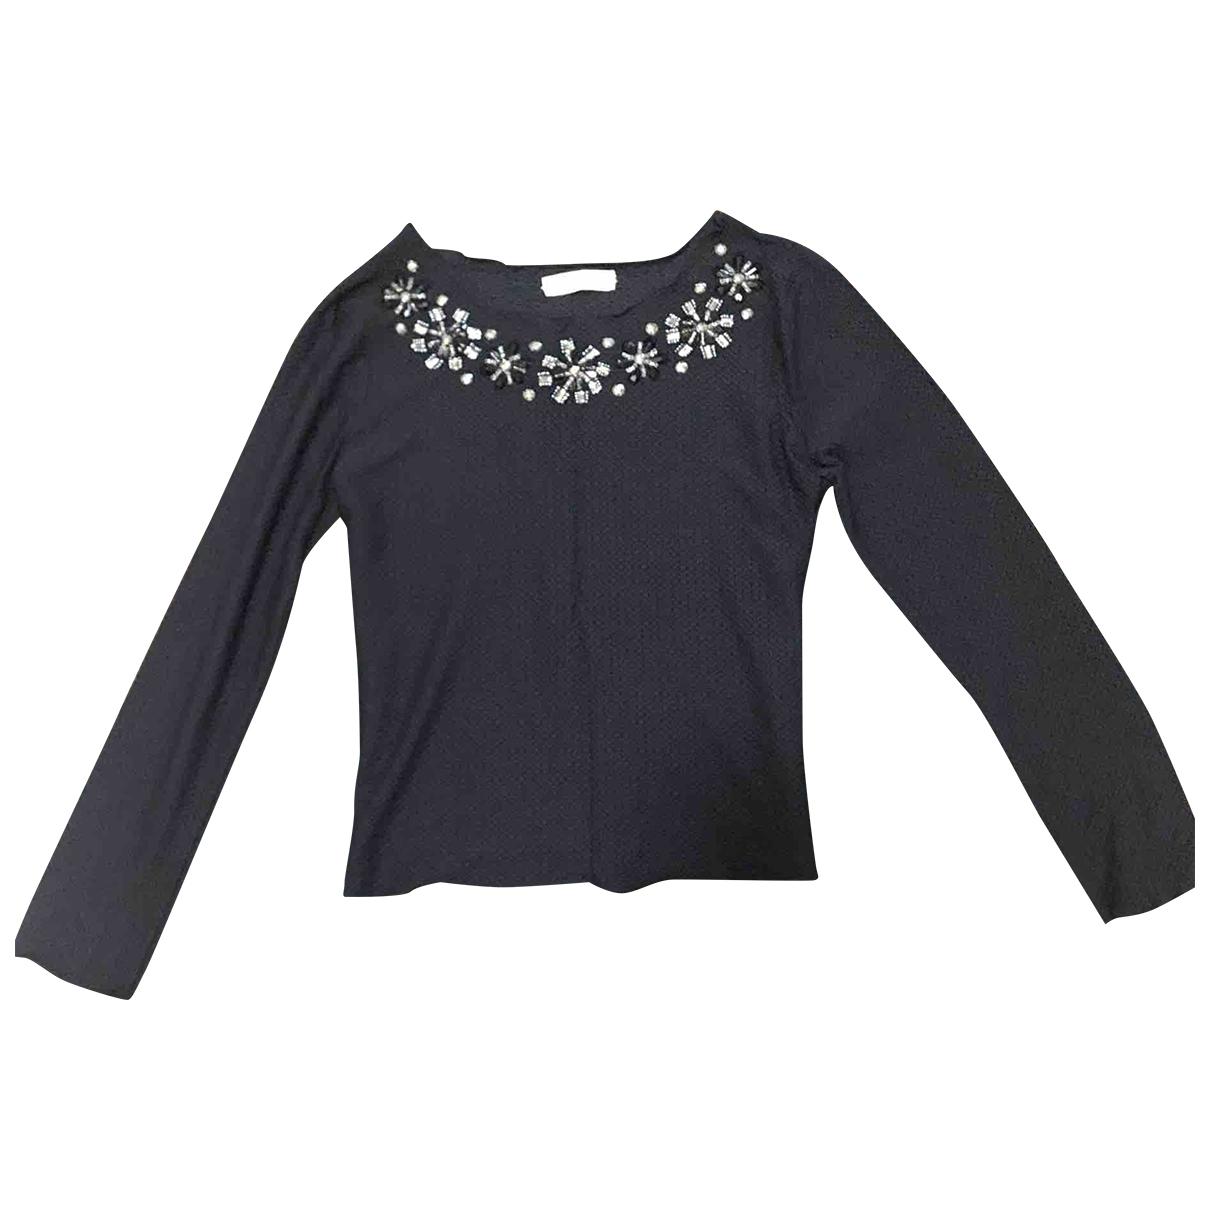 Dolce & Gabbana \N Black  top for Women M International